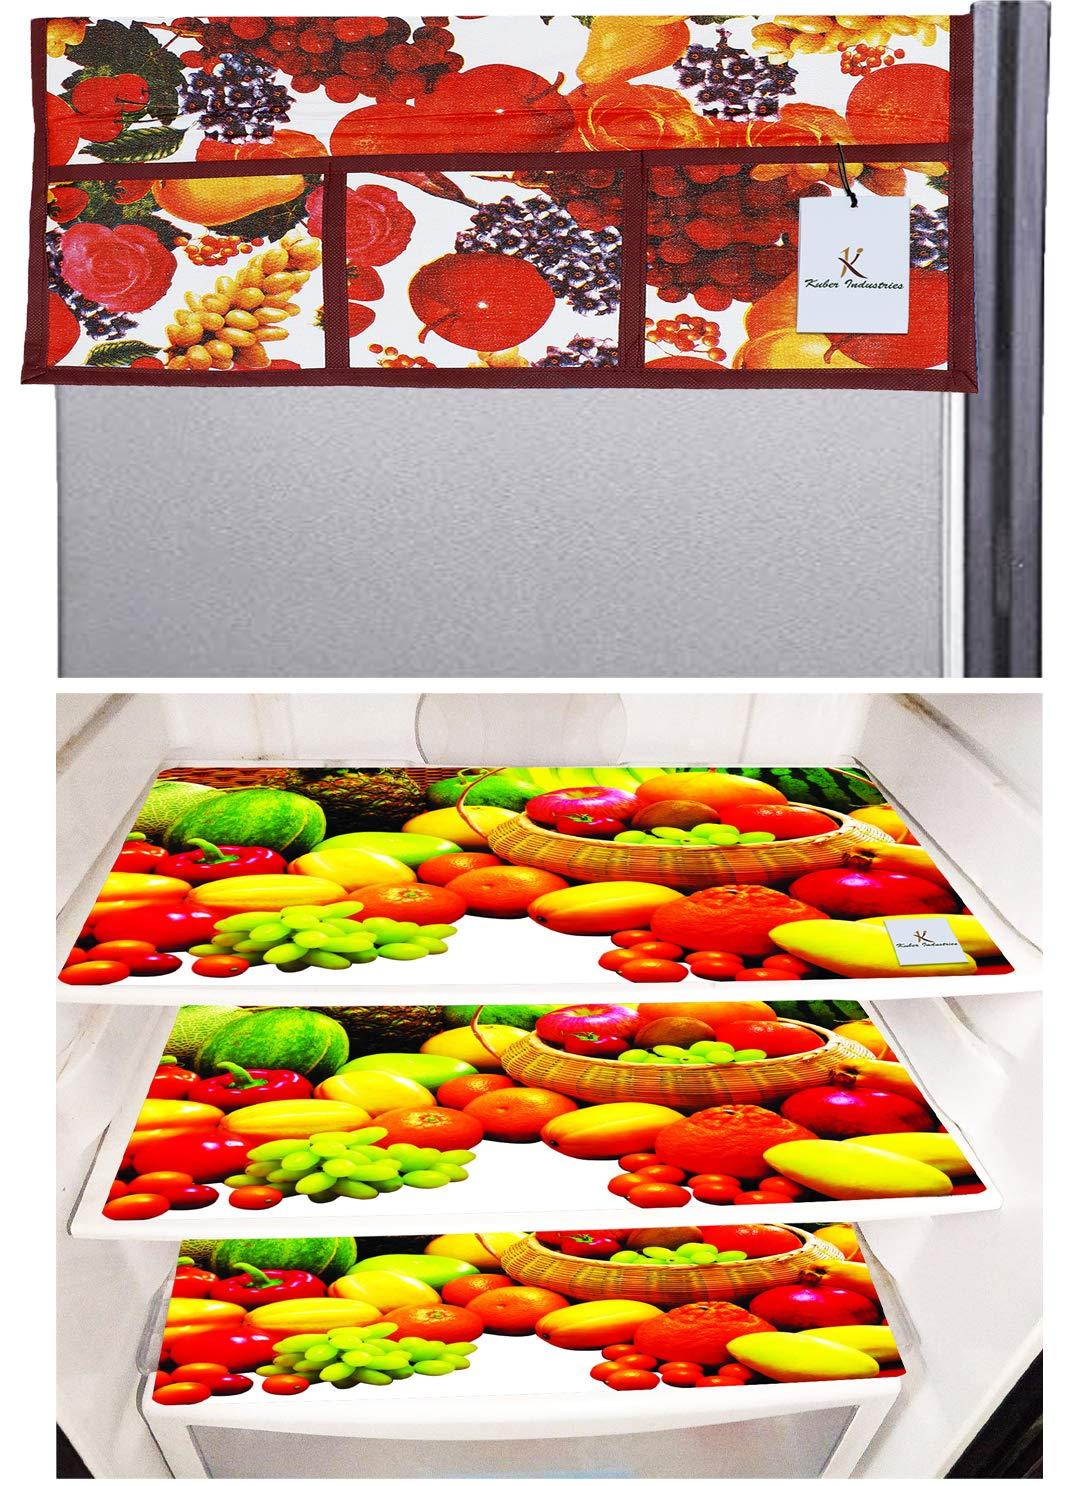 Buy Kuber Industries Fruits Design 3 Pieces Pvc Fridge Mats And 1